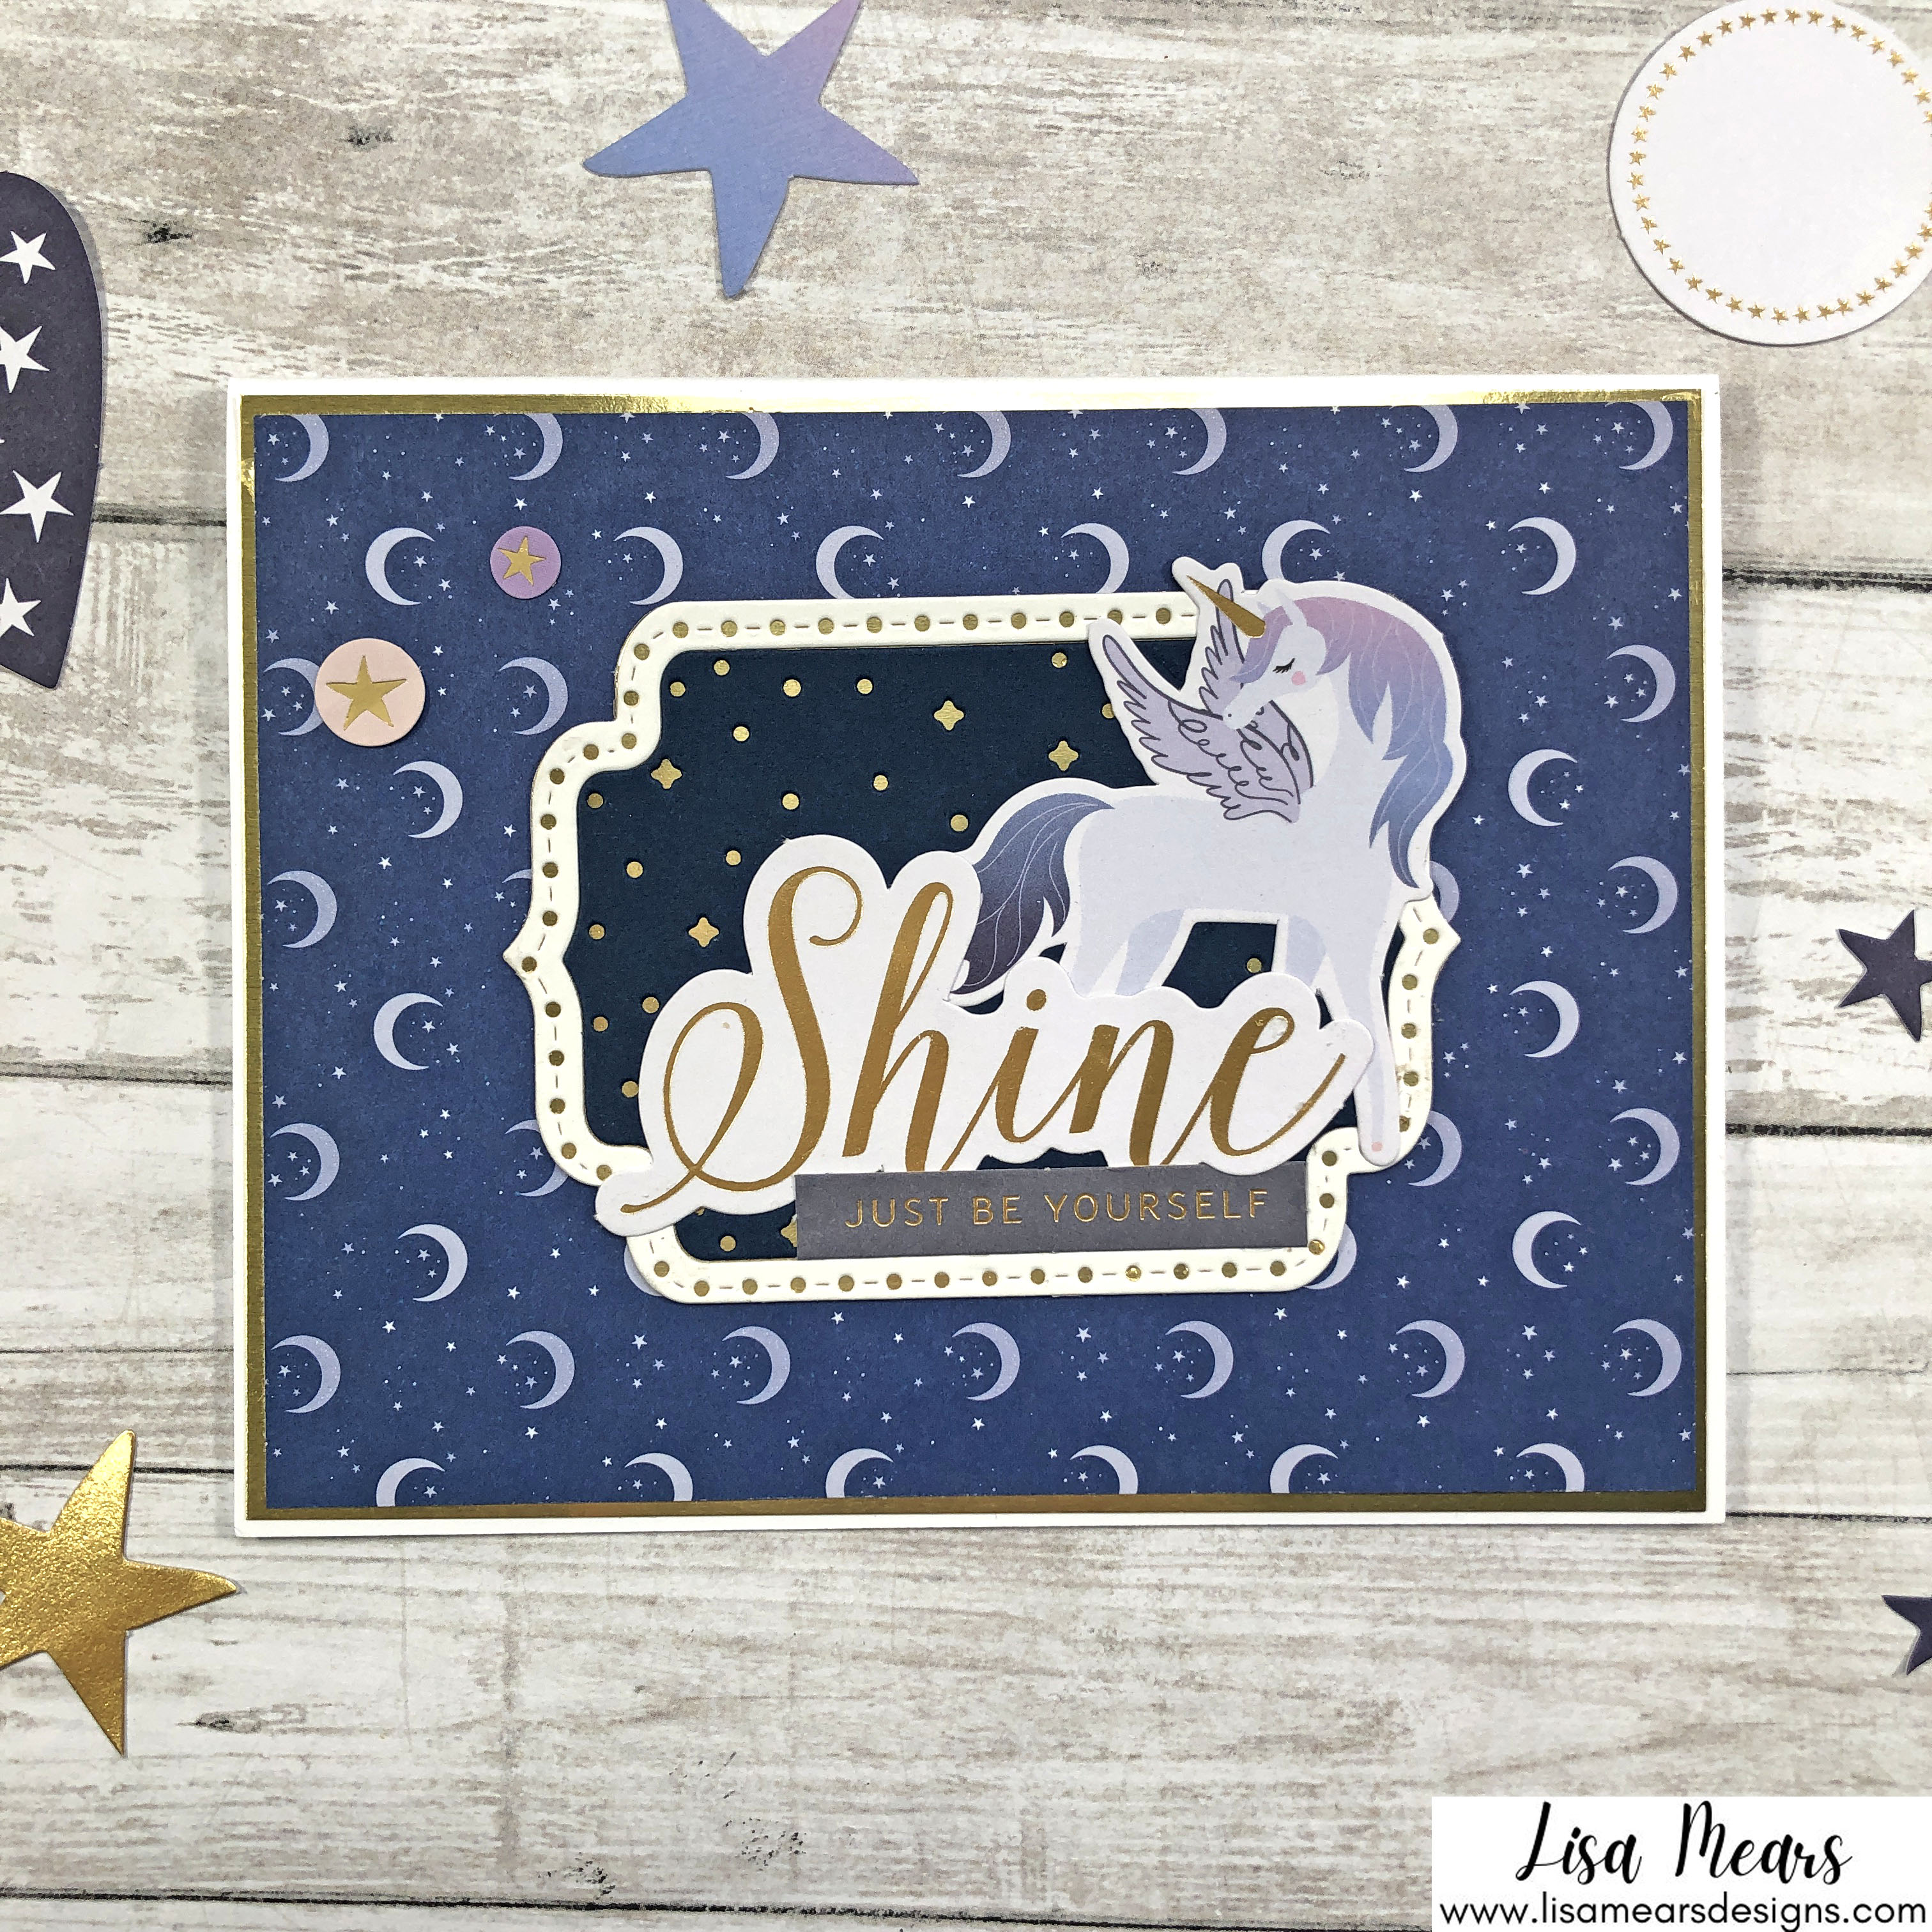 Spellbinders October 2021 Card Kit - You are Stellar! Unicorn Card